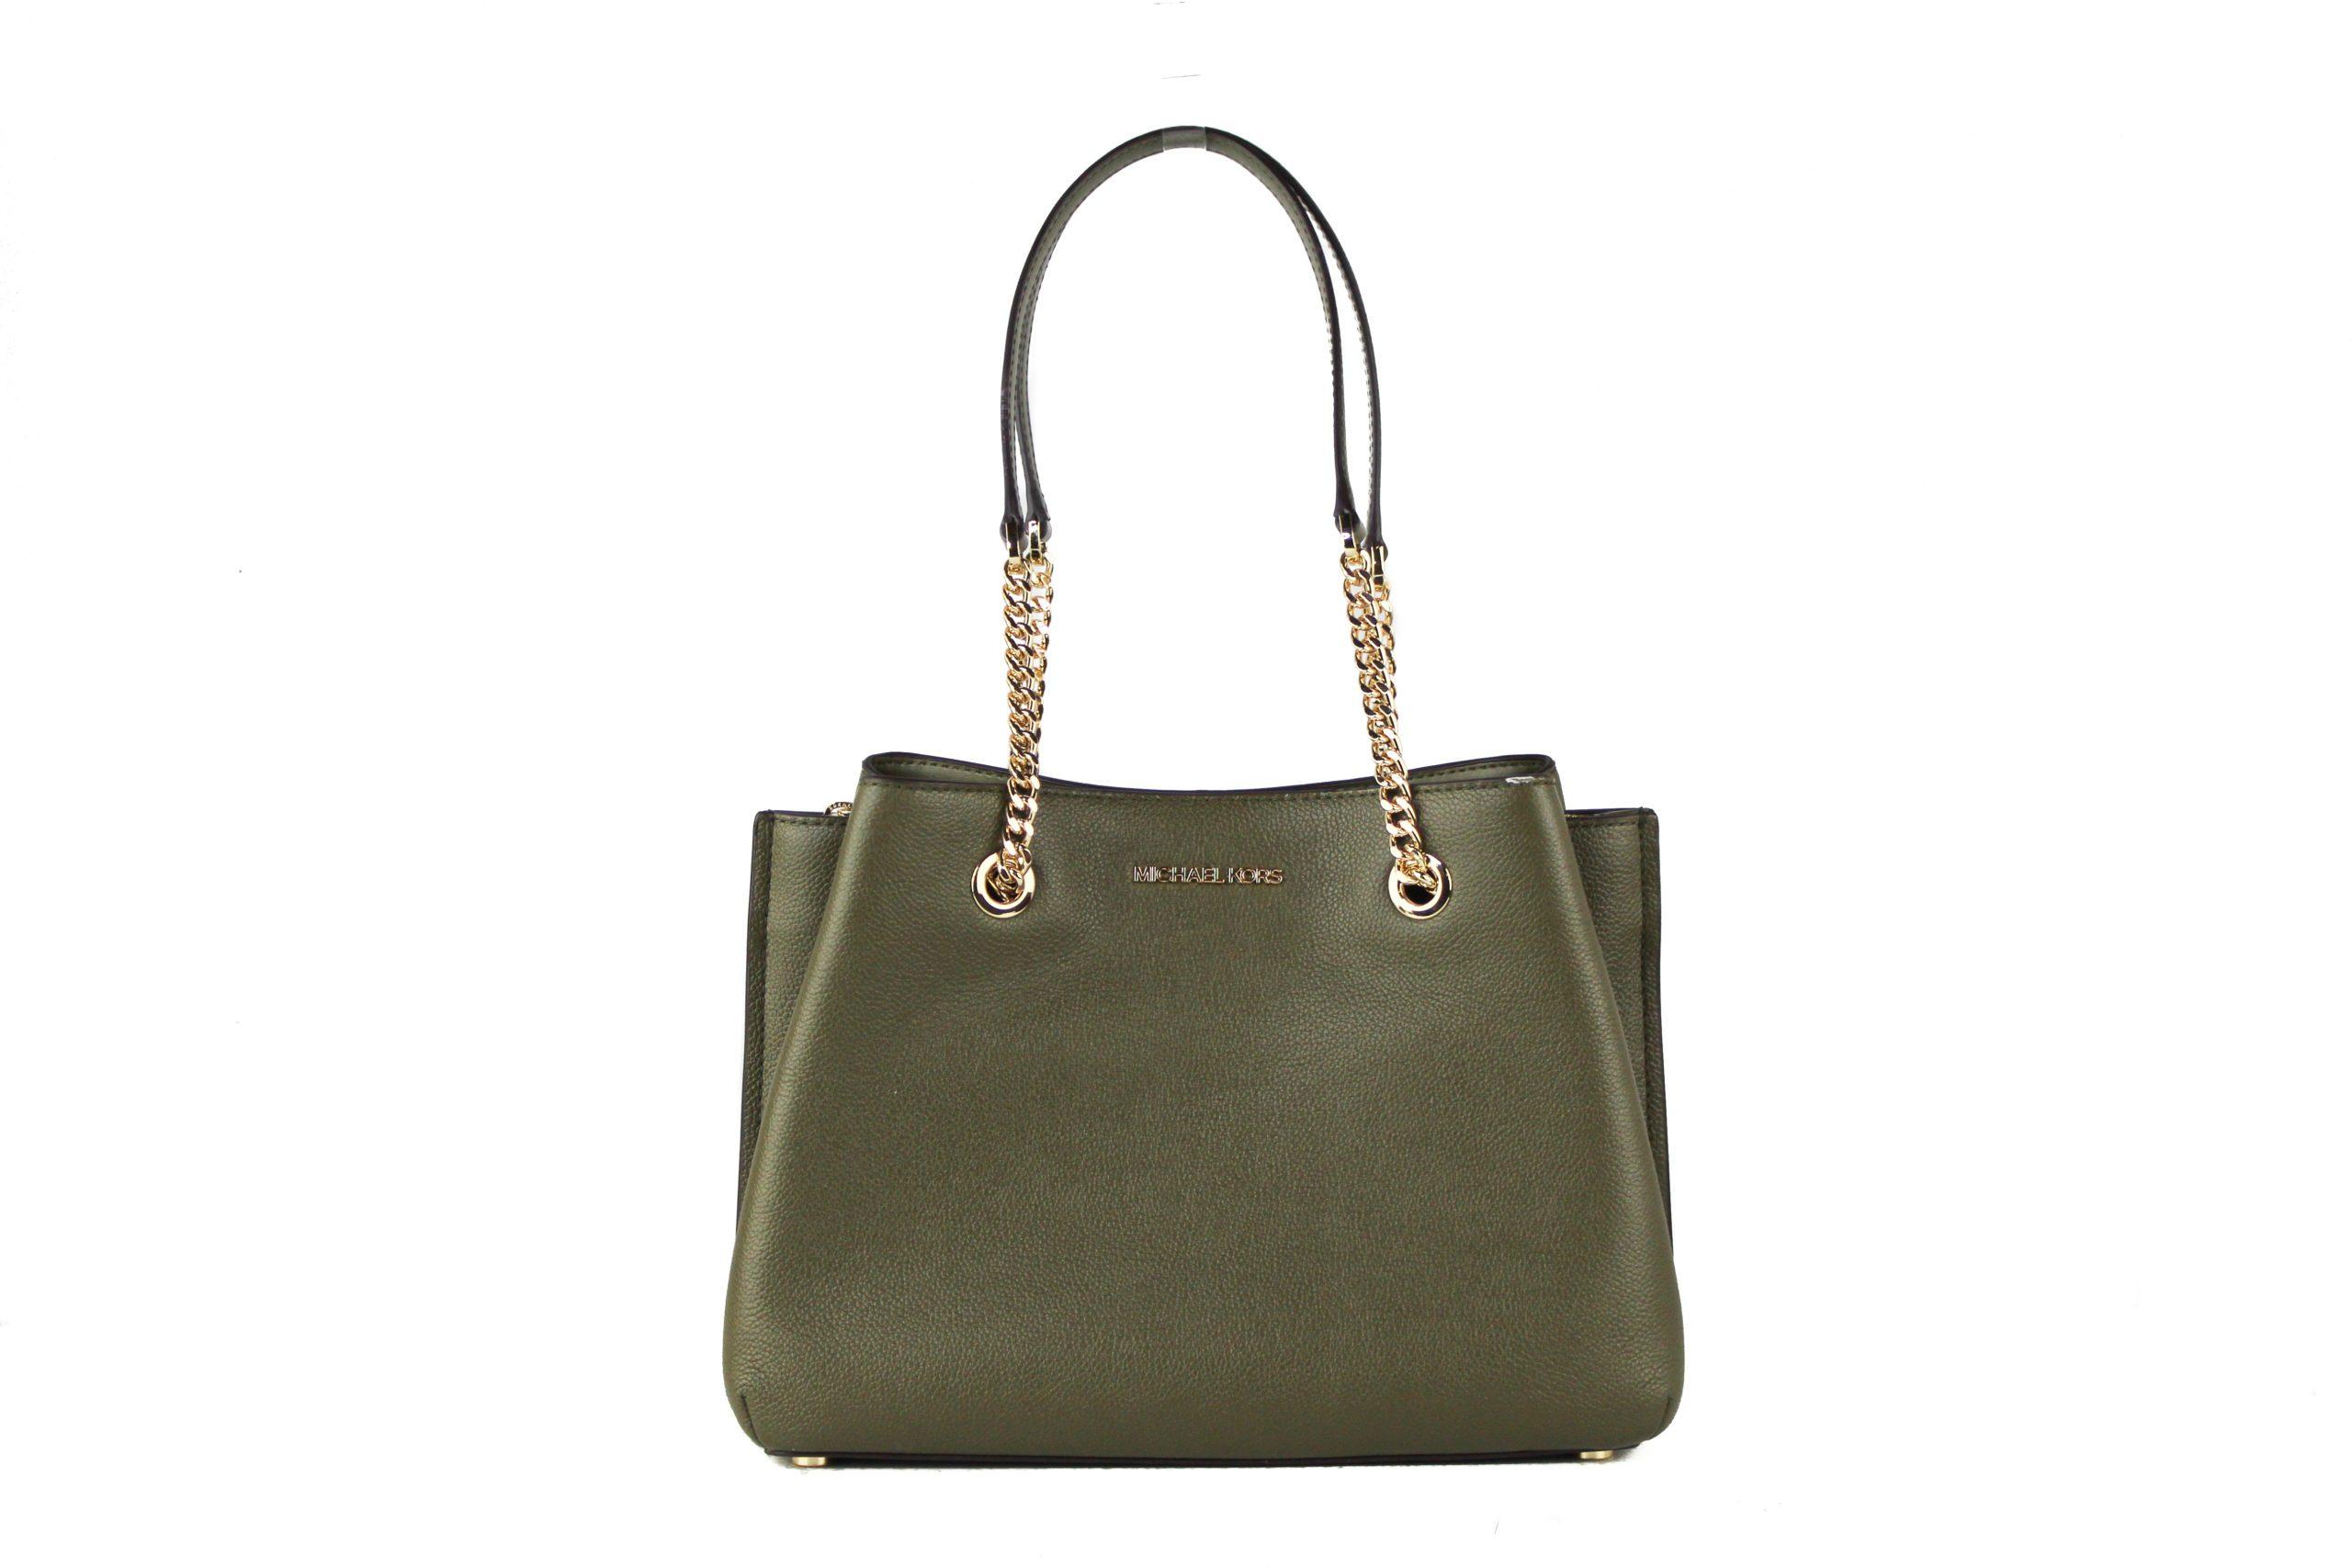 Michael Kors Women's Teagen Large Leather Long Drop Shoulder Bag Green 709994